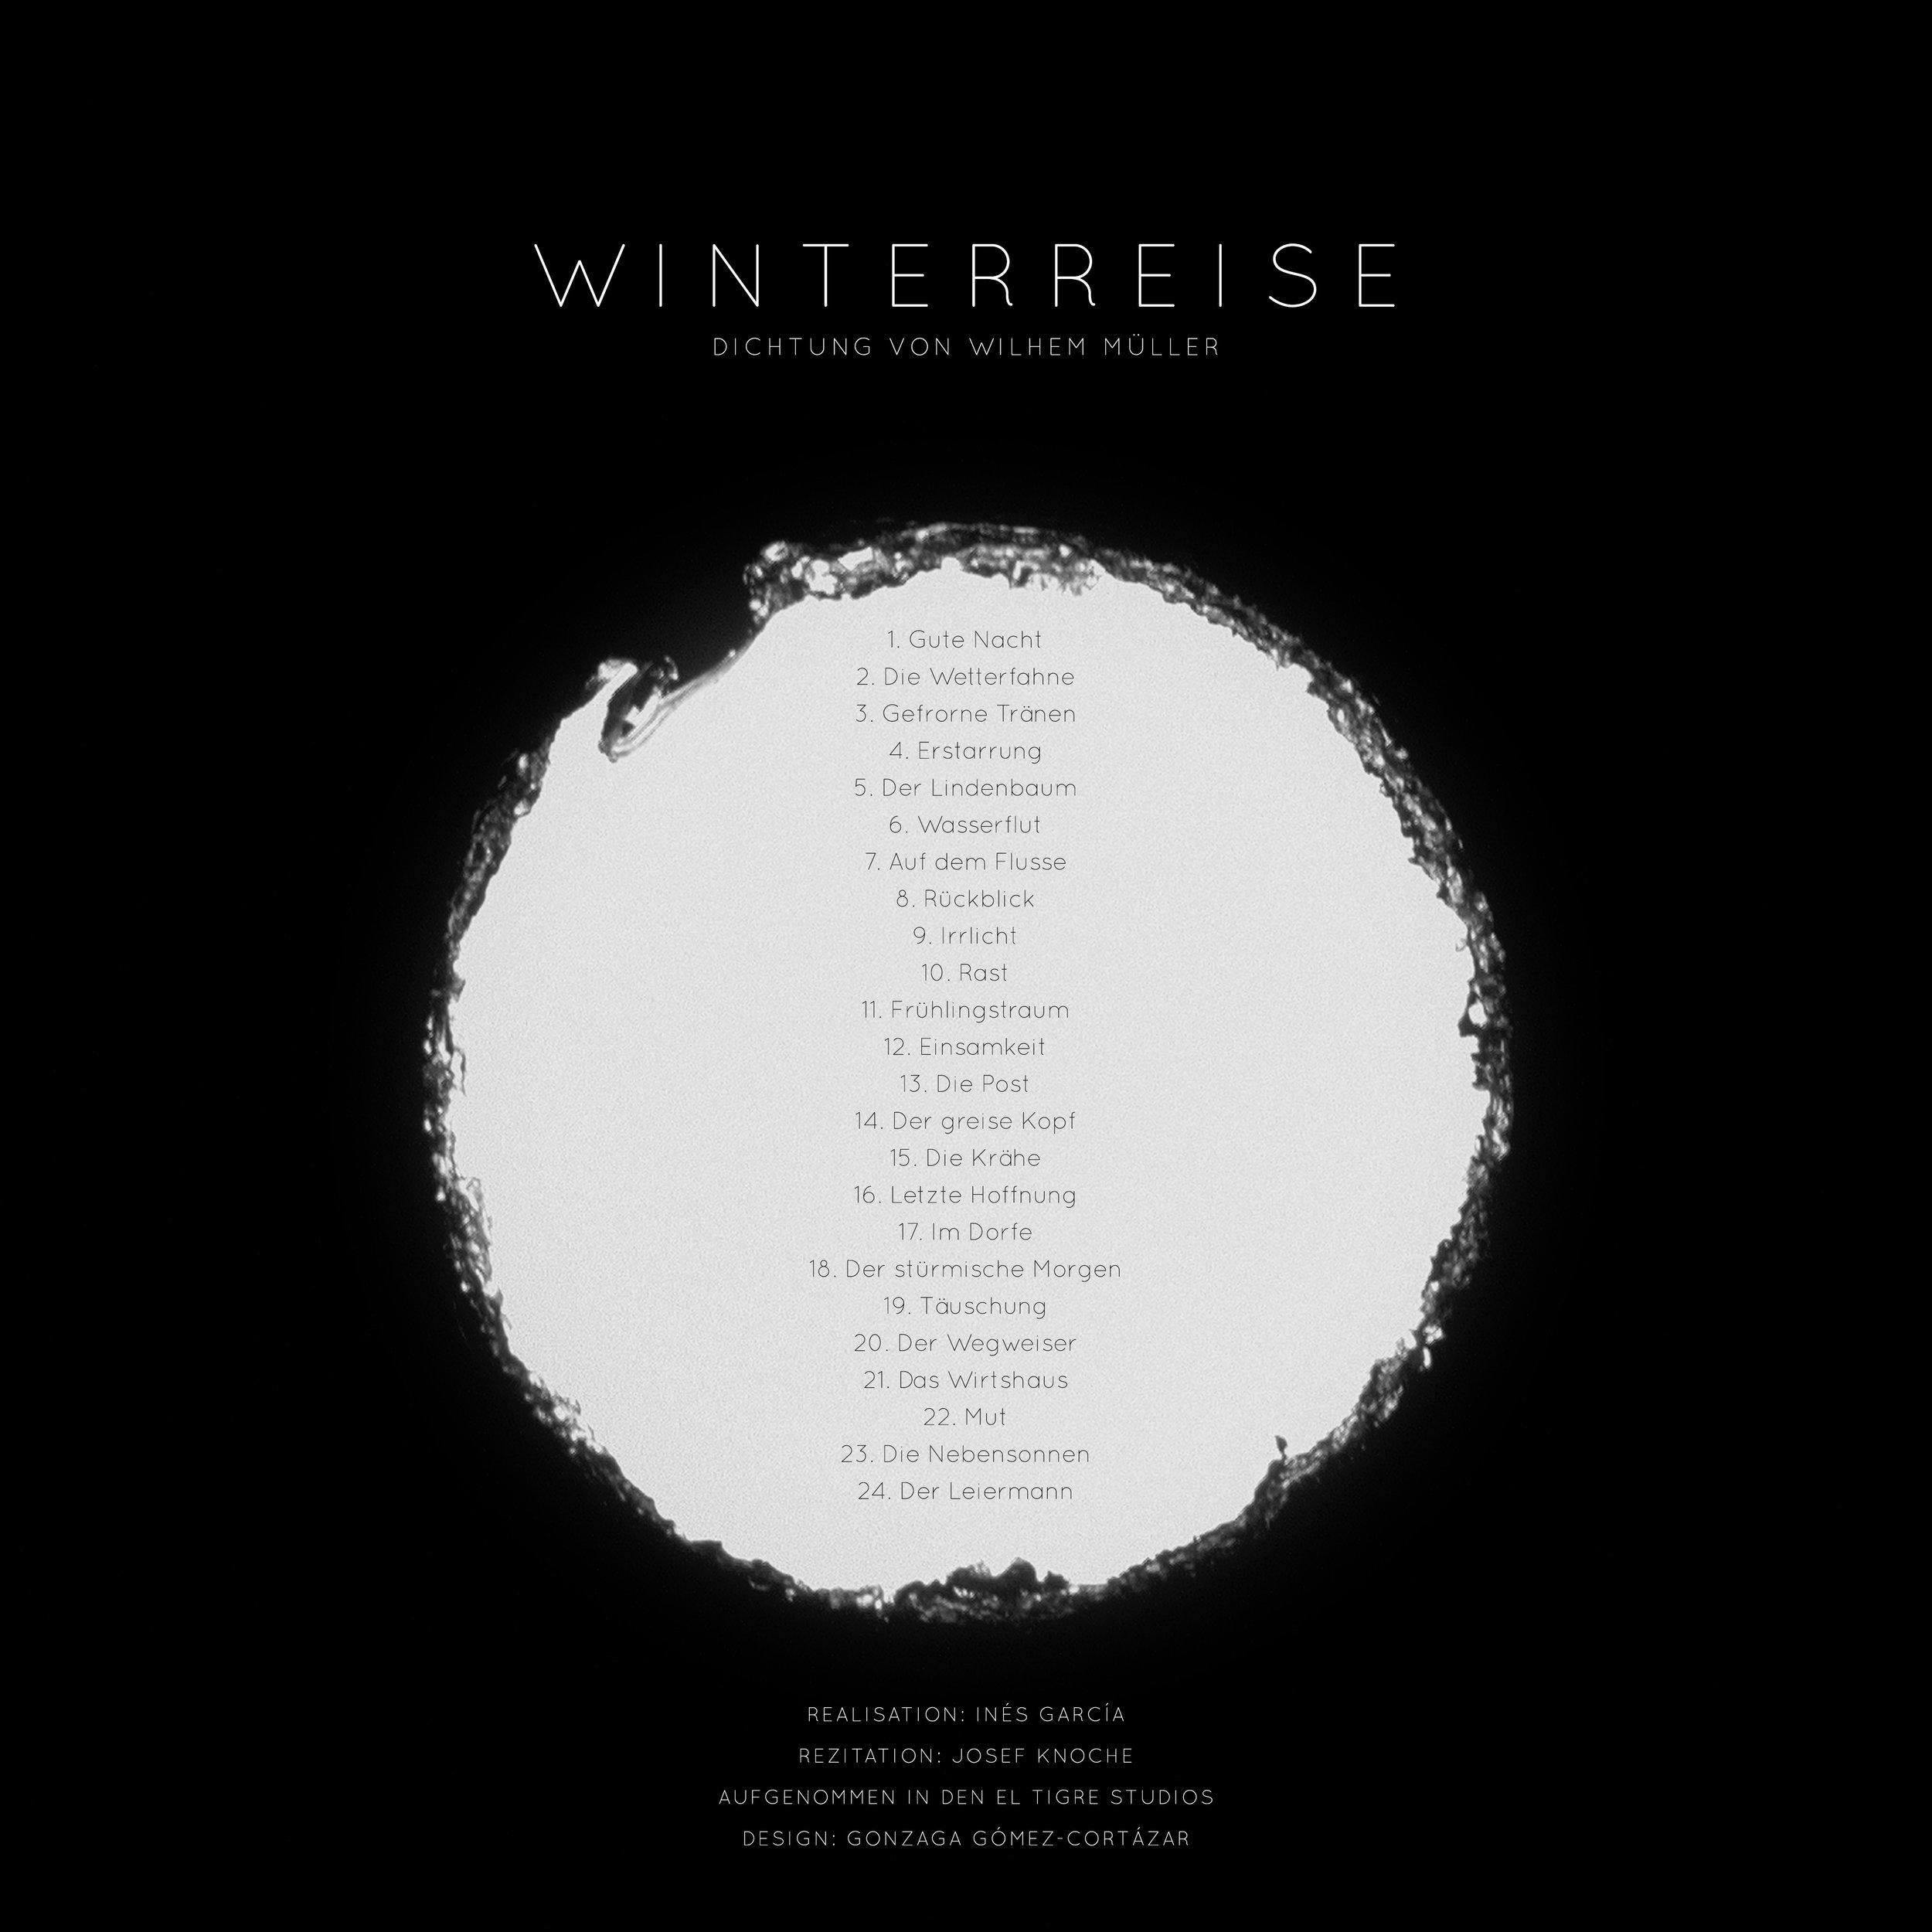 Vinyl back cover   2017,18'52'',vinyl,turntable, headphones  Design: Gonzaga Gómez-Cortázar